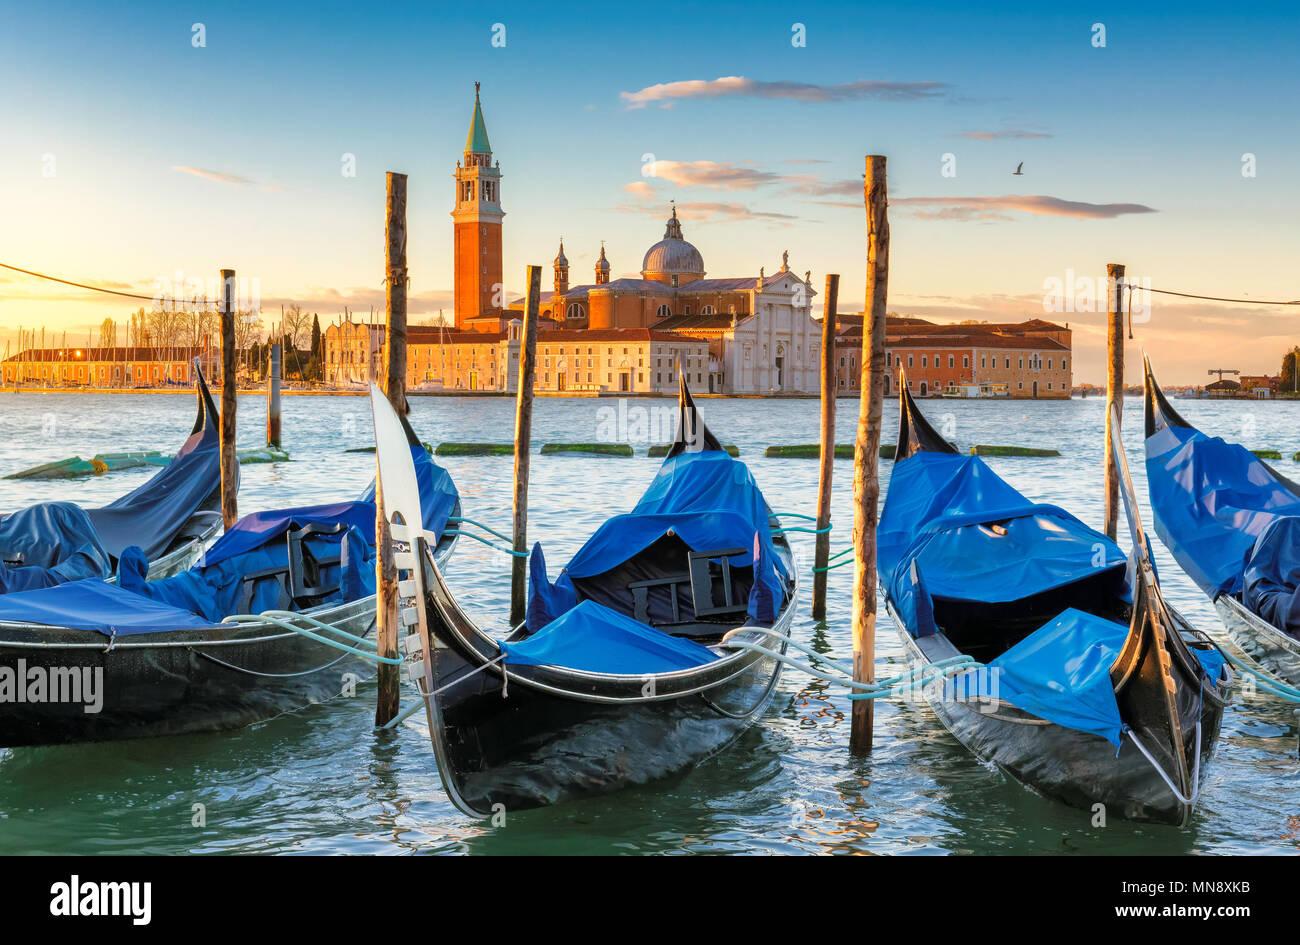 Venice gondolas near San Marco square at sunrise, Grand Canal, Venice, Italy. - Stock Image